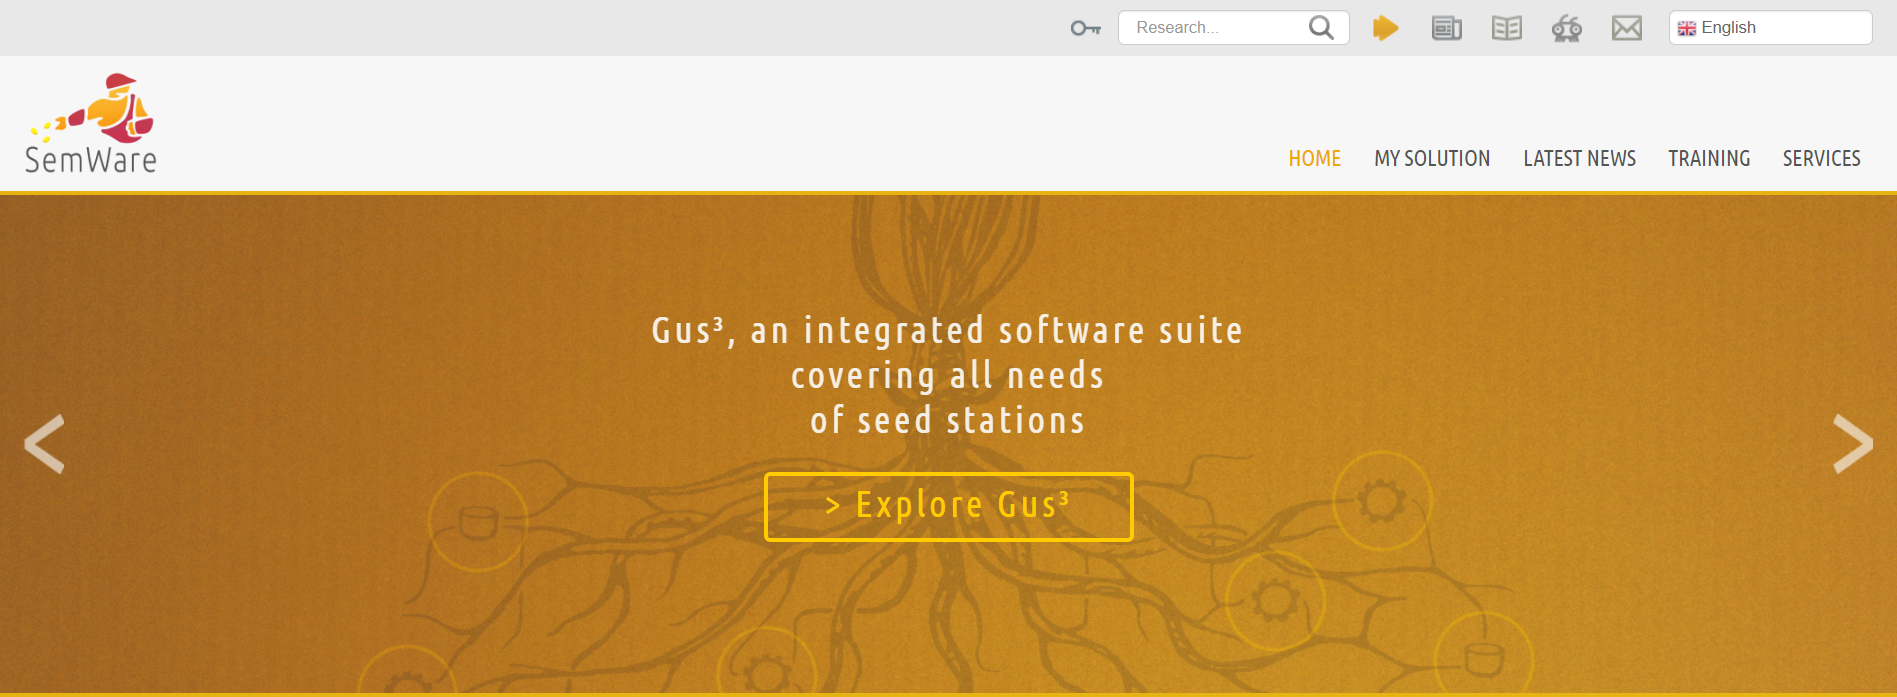 Die neue SemWare-Website ist online!